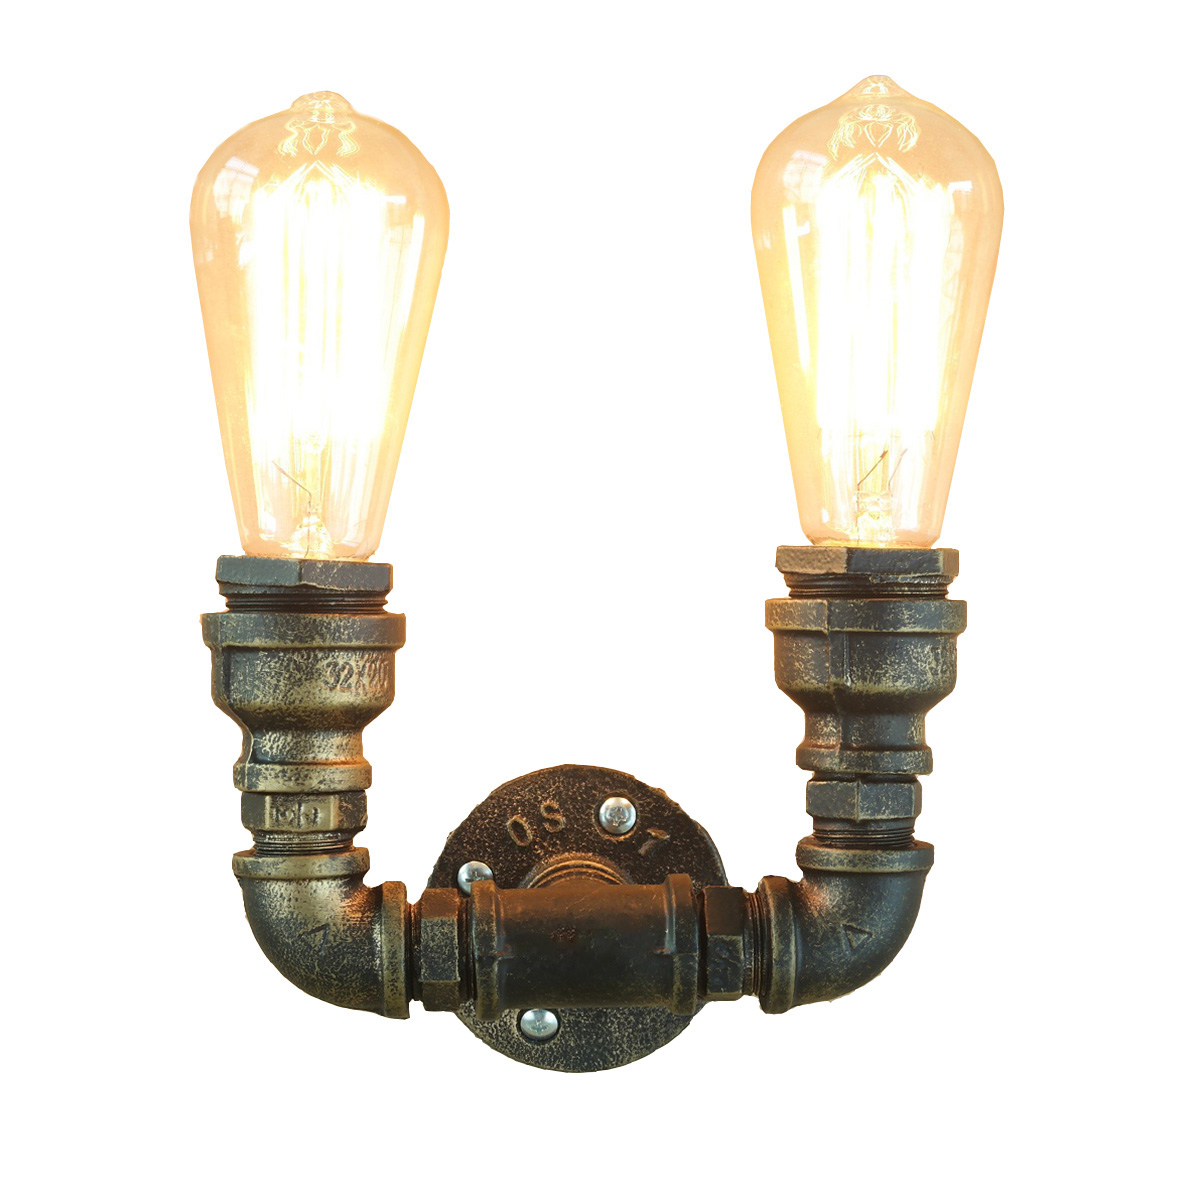 ФОТО YK2404 E27 Lighting Double-end Water Pipe Vintage Industrial Metal Wall Lamp Retro Led Wall Lighting Lamp Light